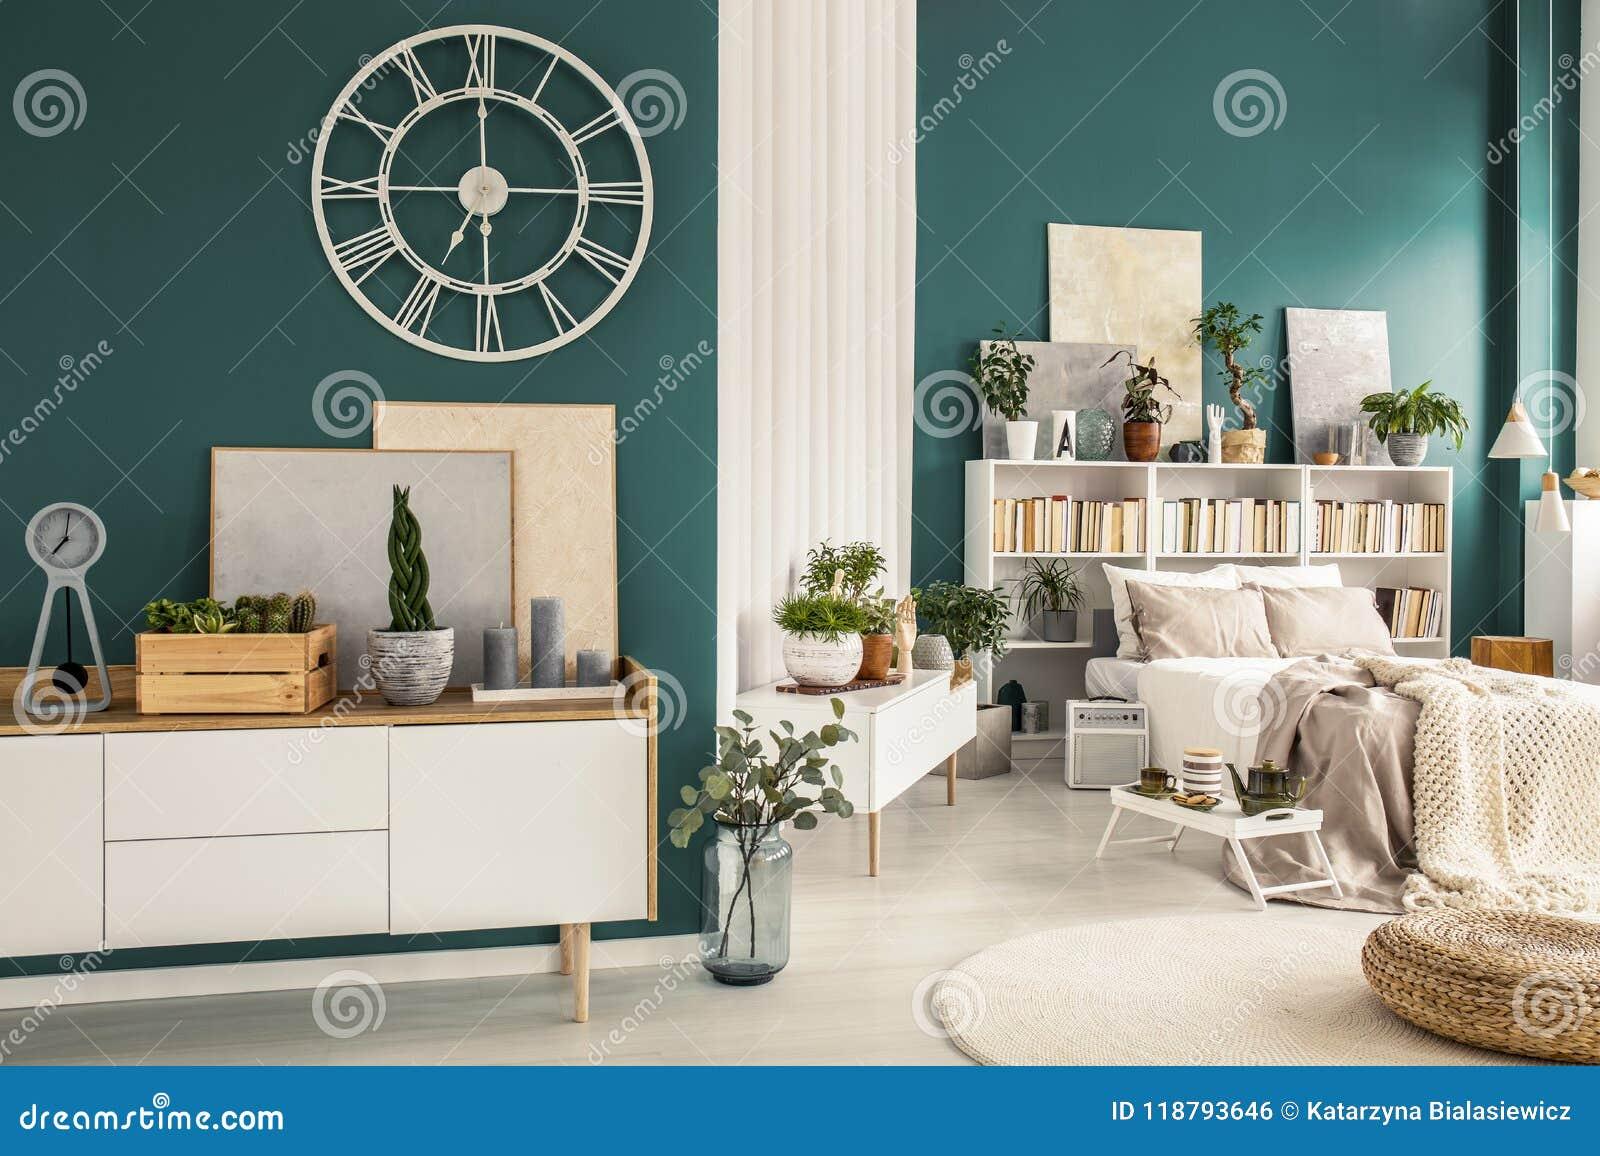 Studio Apartment With Designer Decorations Stock Photo Image Of